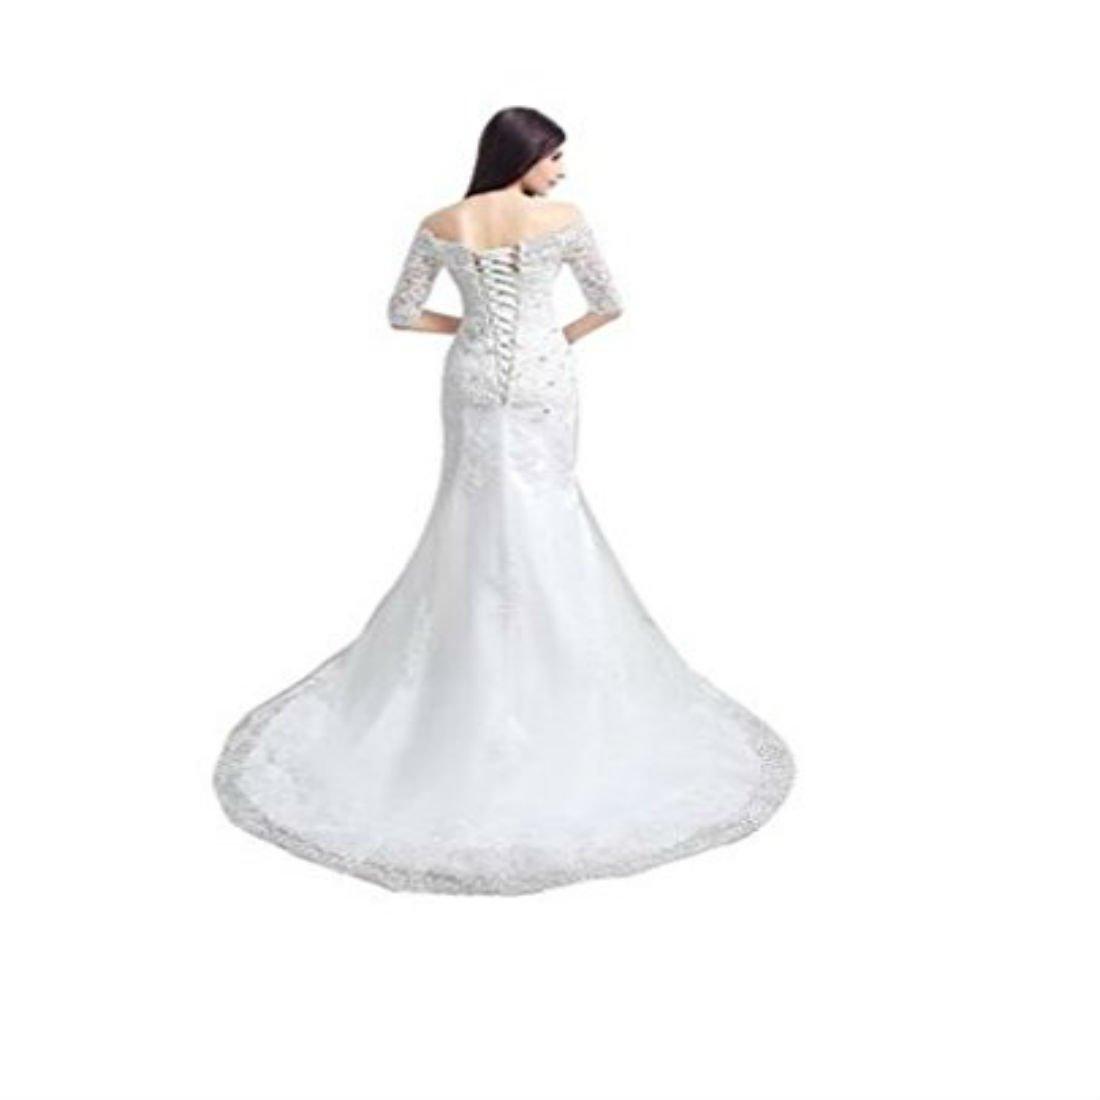 Yilian Mermaid Lace Half Sleeves Wedding Dresses At Amazon Women S